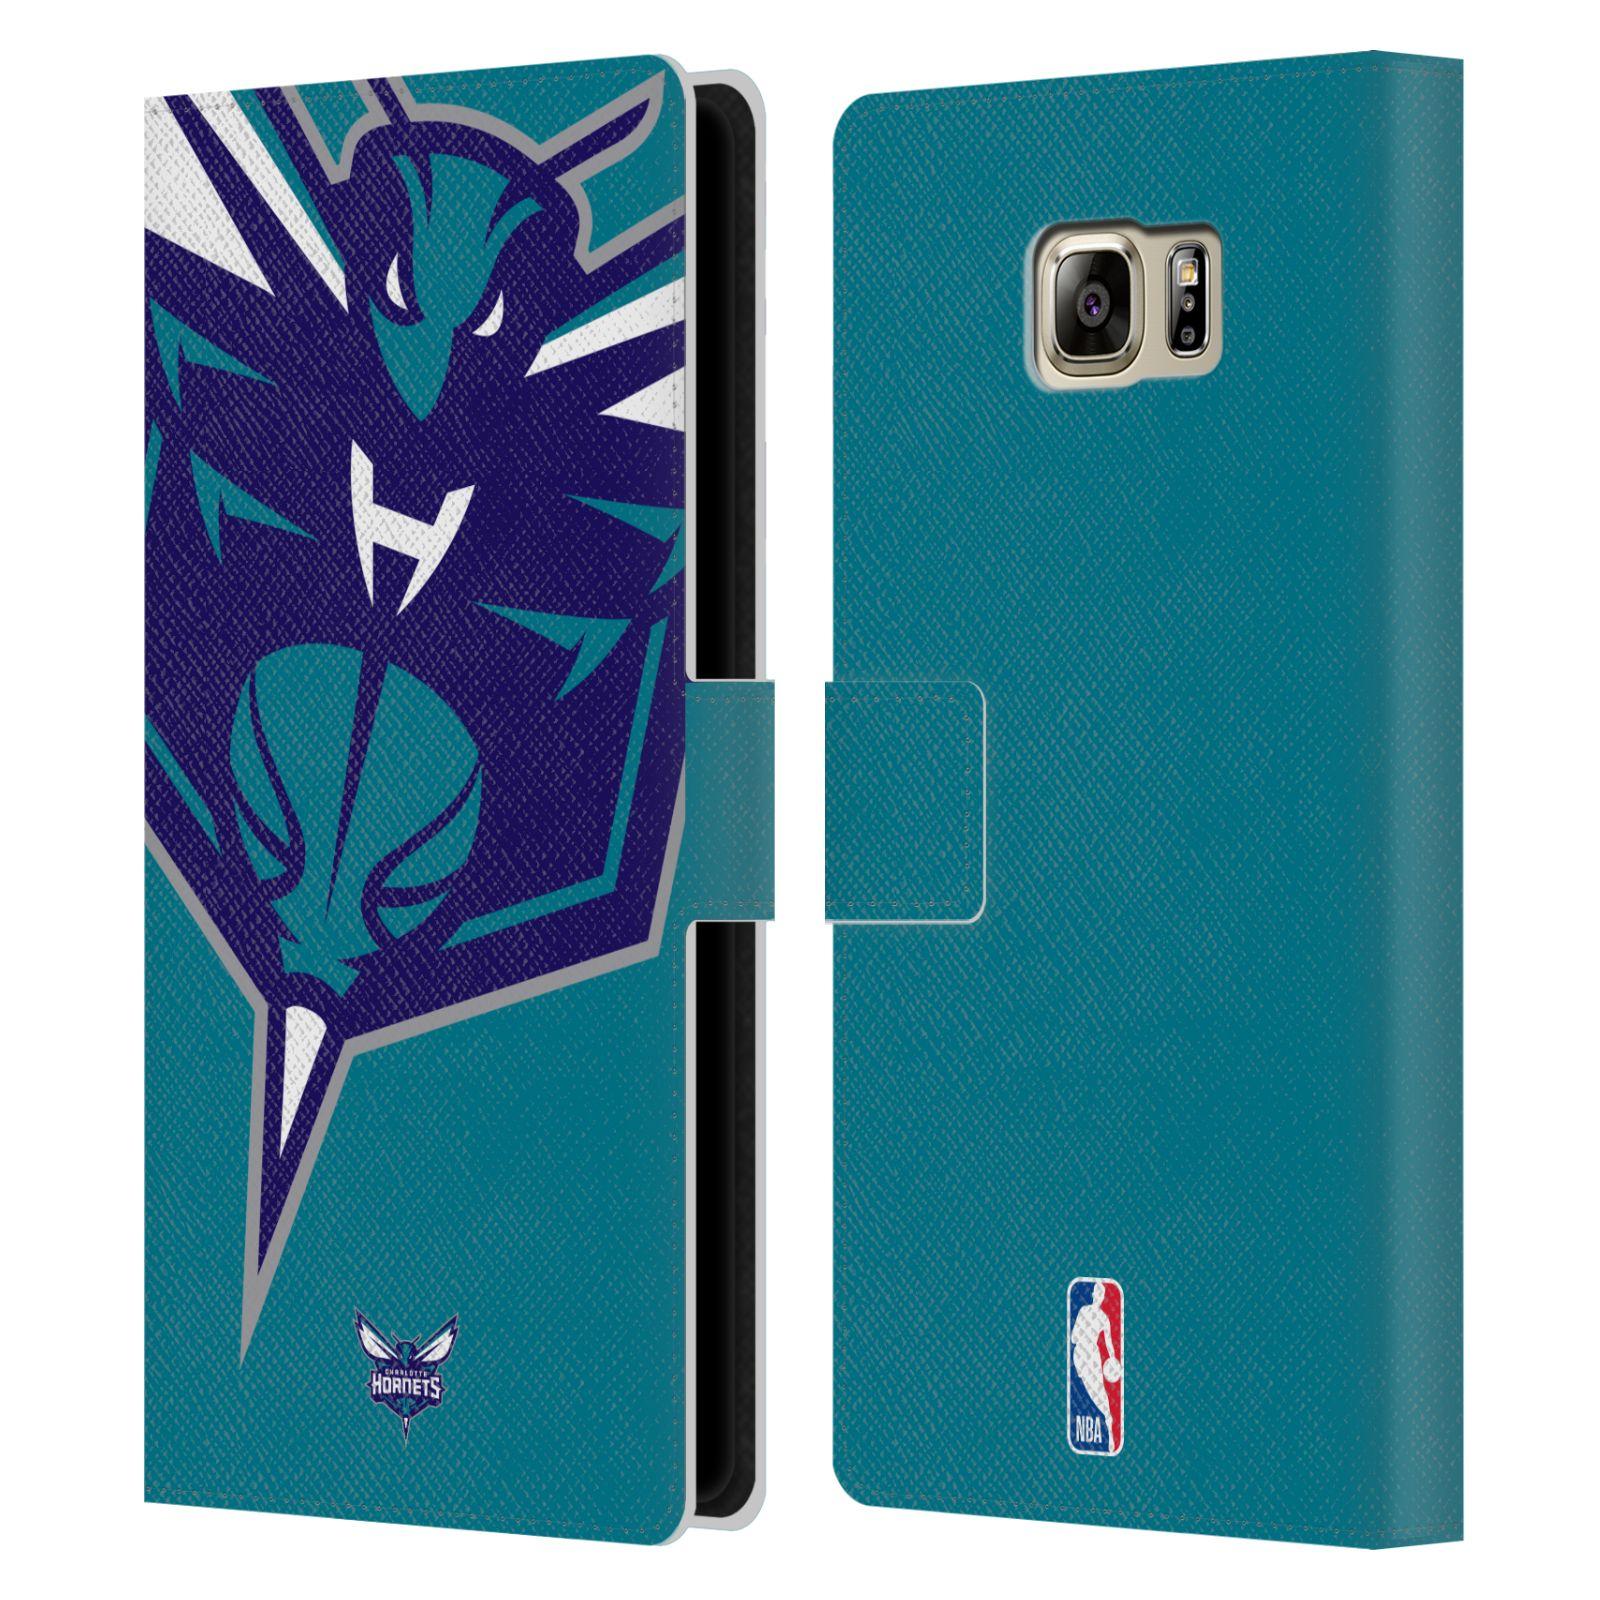 Pouzdro na mobil Samsung Galaxy NOTE 5 - Head Case -NBA - Charlotte Hornets modrá barva velký znak